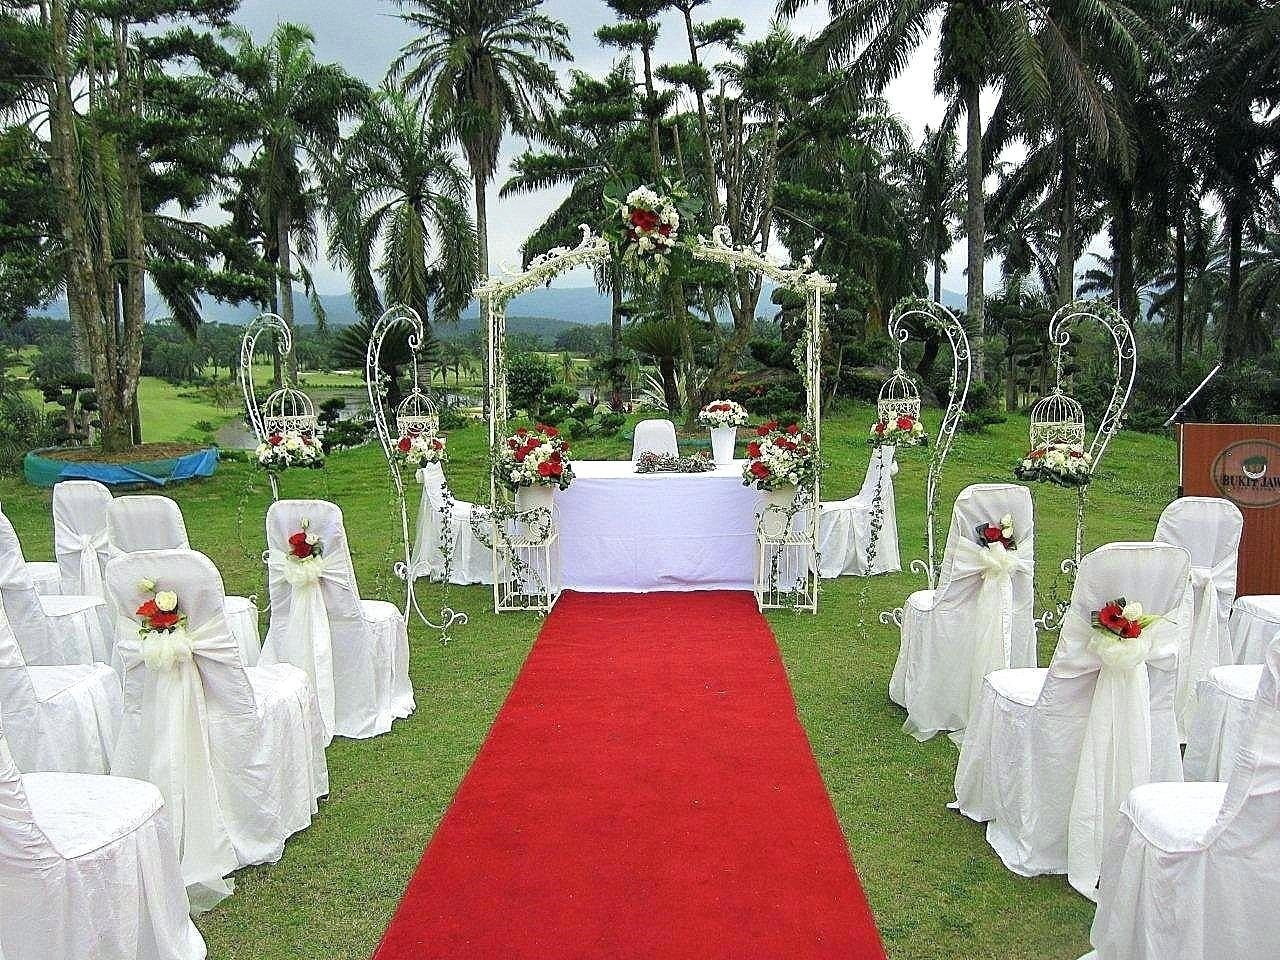 10 Cute Backyard Wedding Ideas For Summer backyard wedding ideas simple cheap backyard wedding ideas outdoor